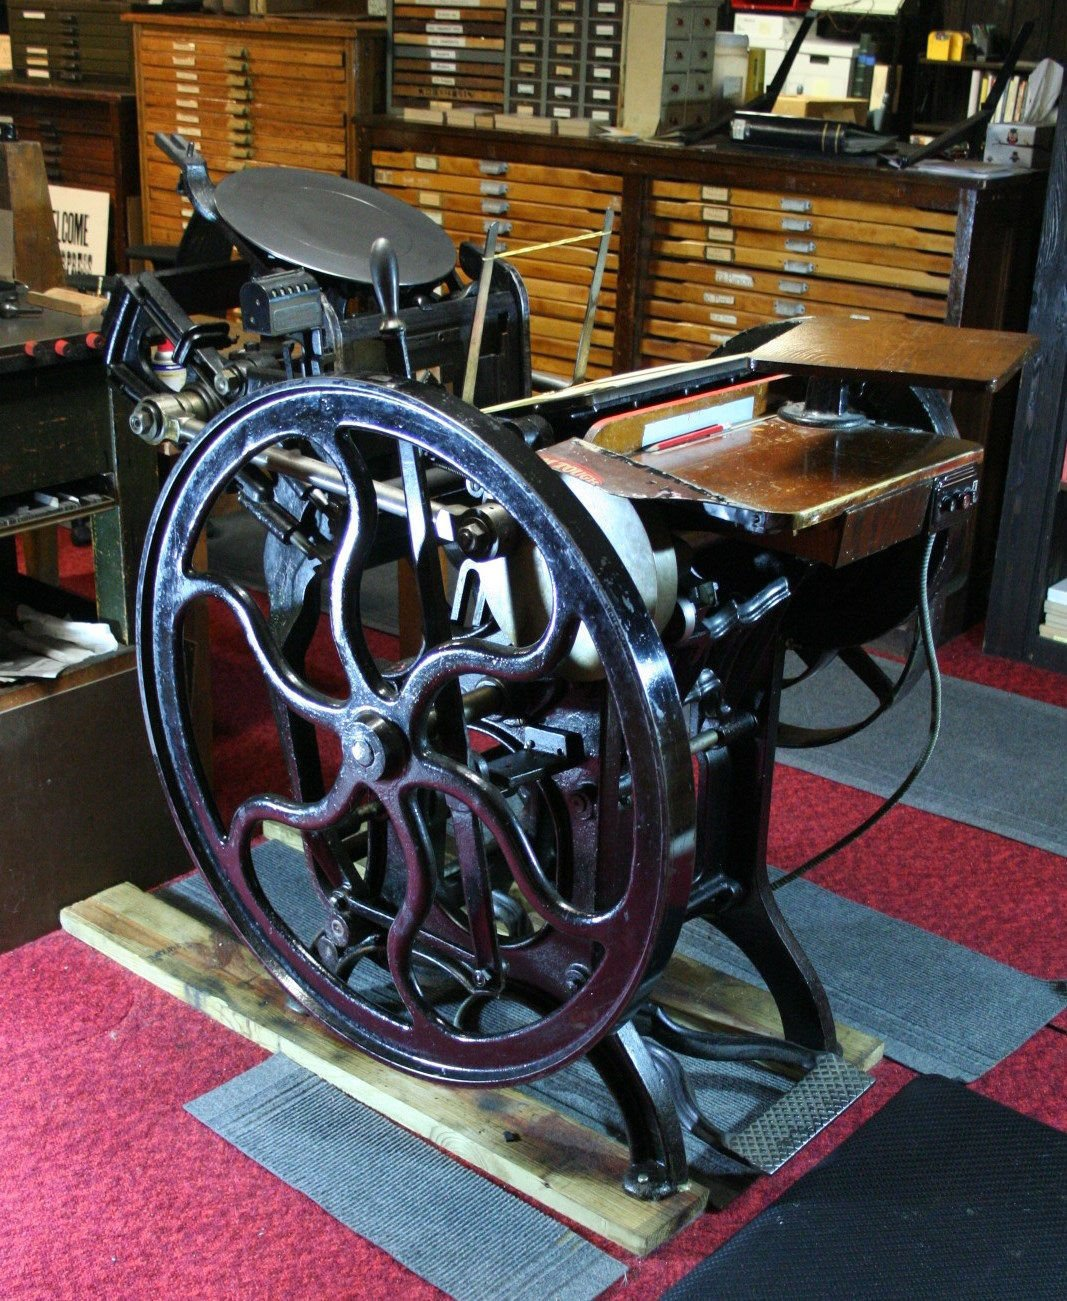 Things That Matter: Adolph Liesenfeld's printing press